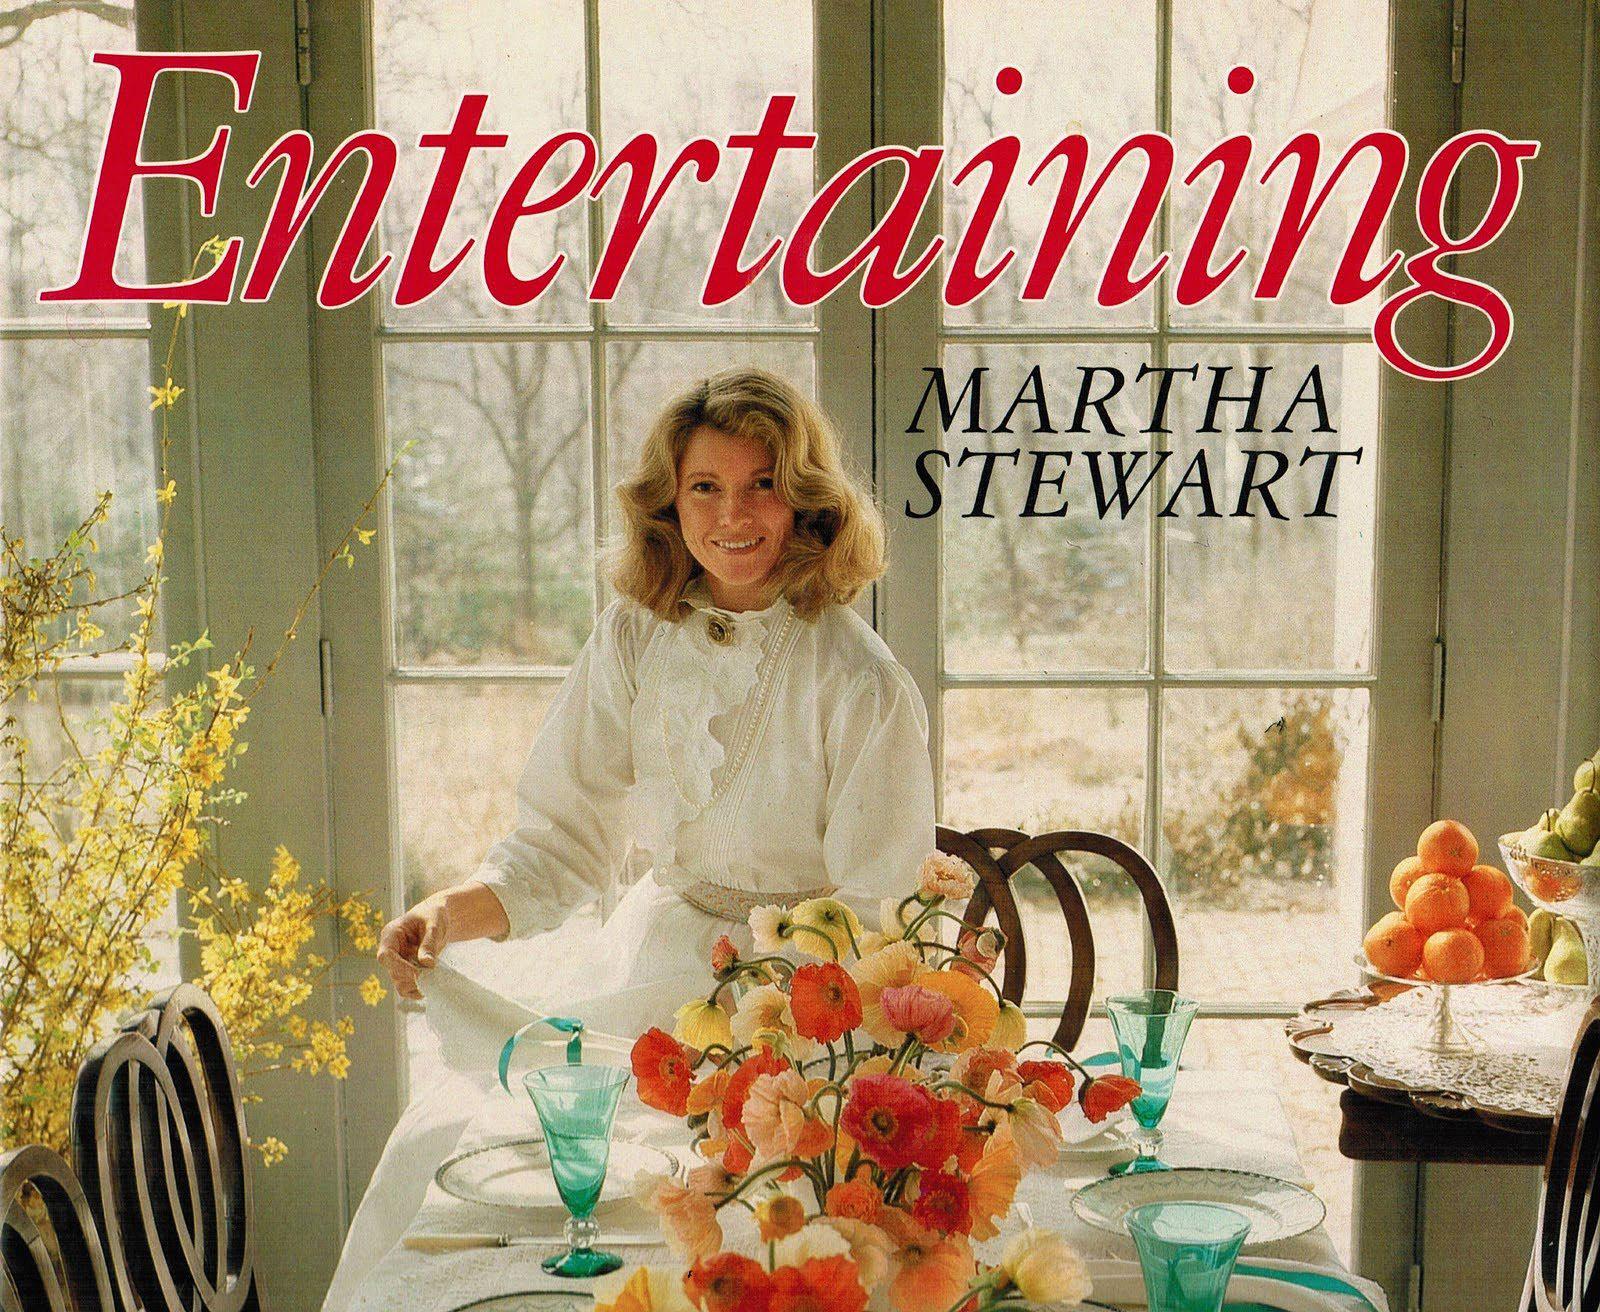 martha-stewart-entertaining_1982.jpg